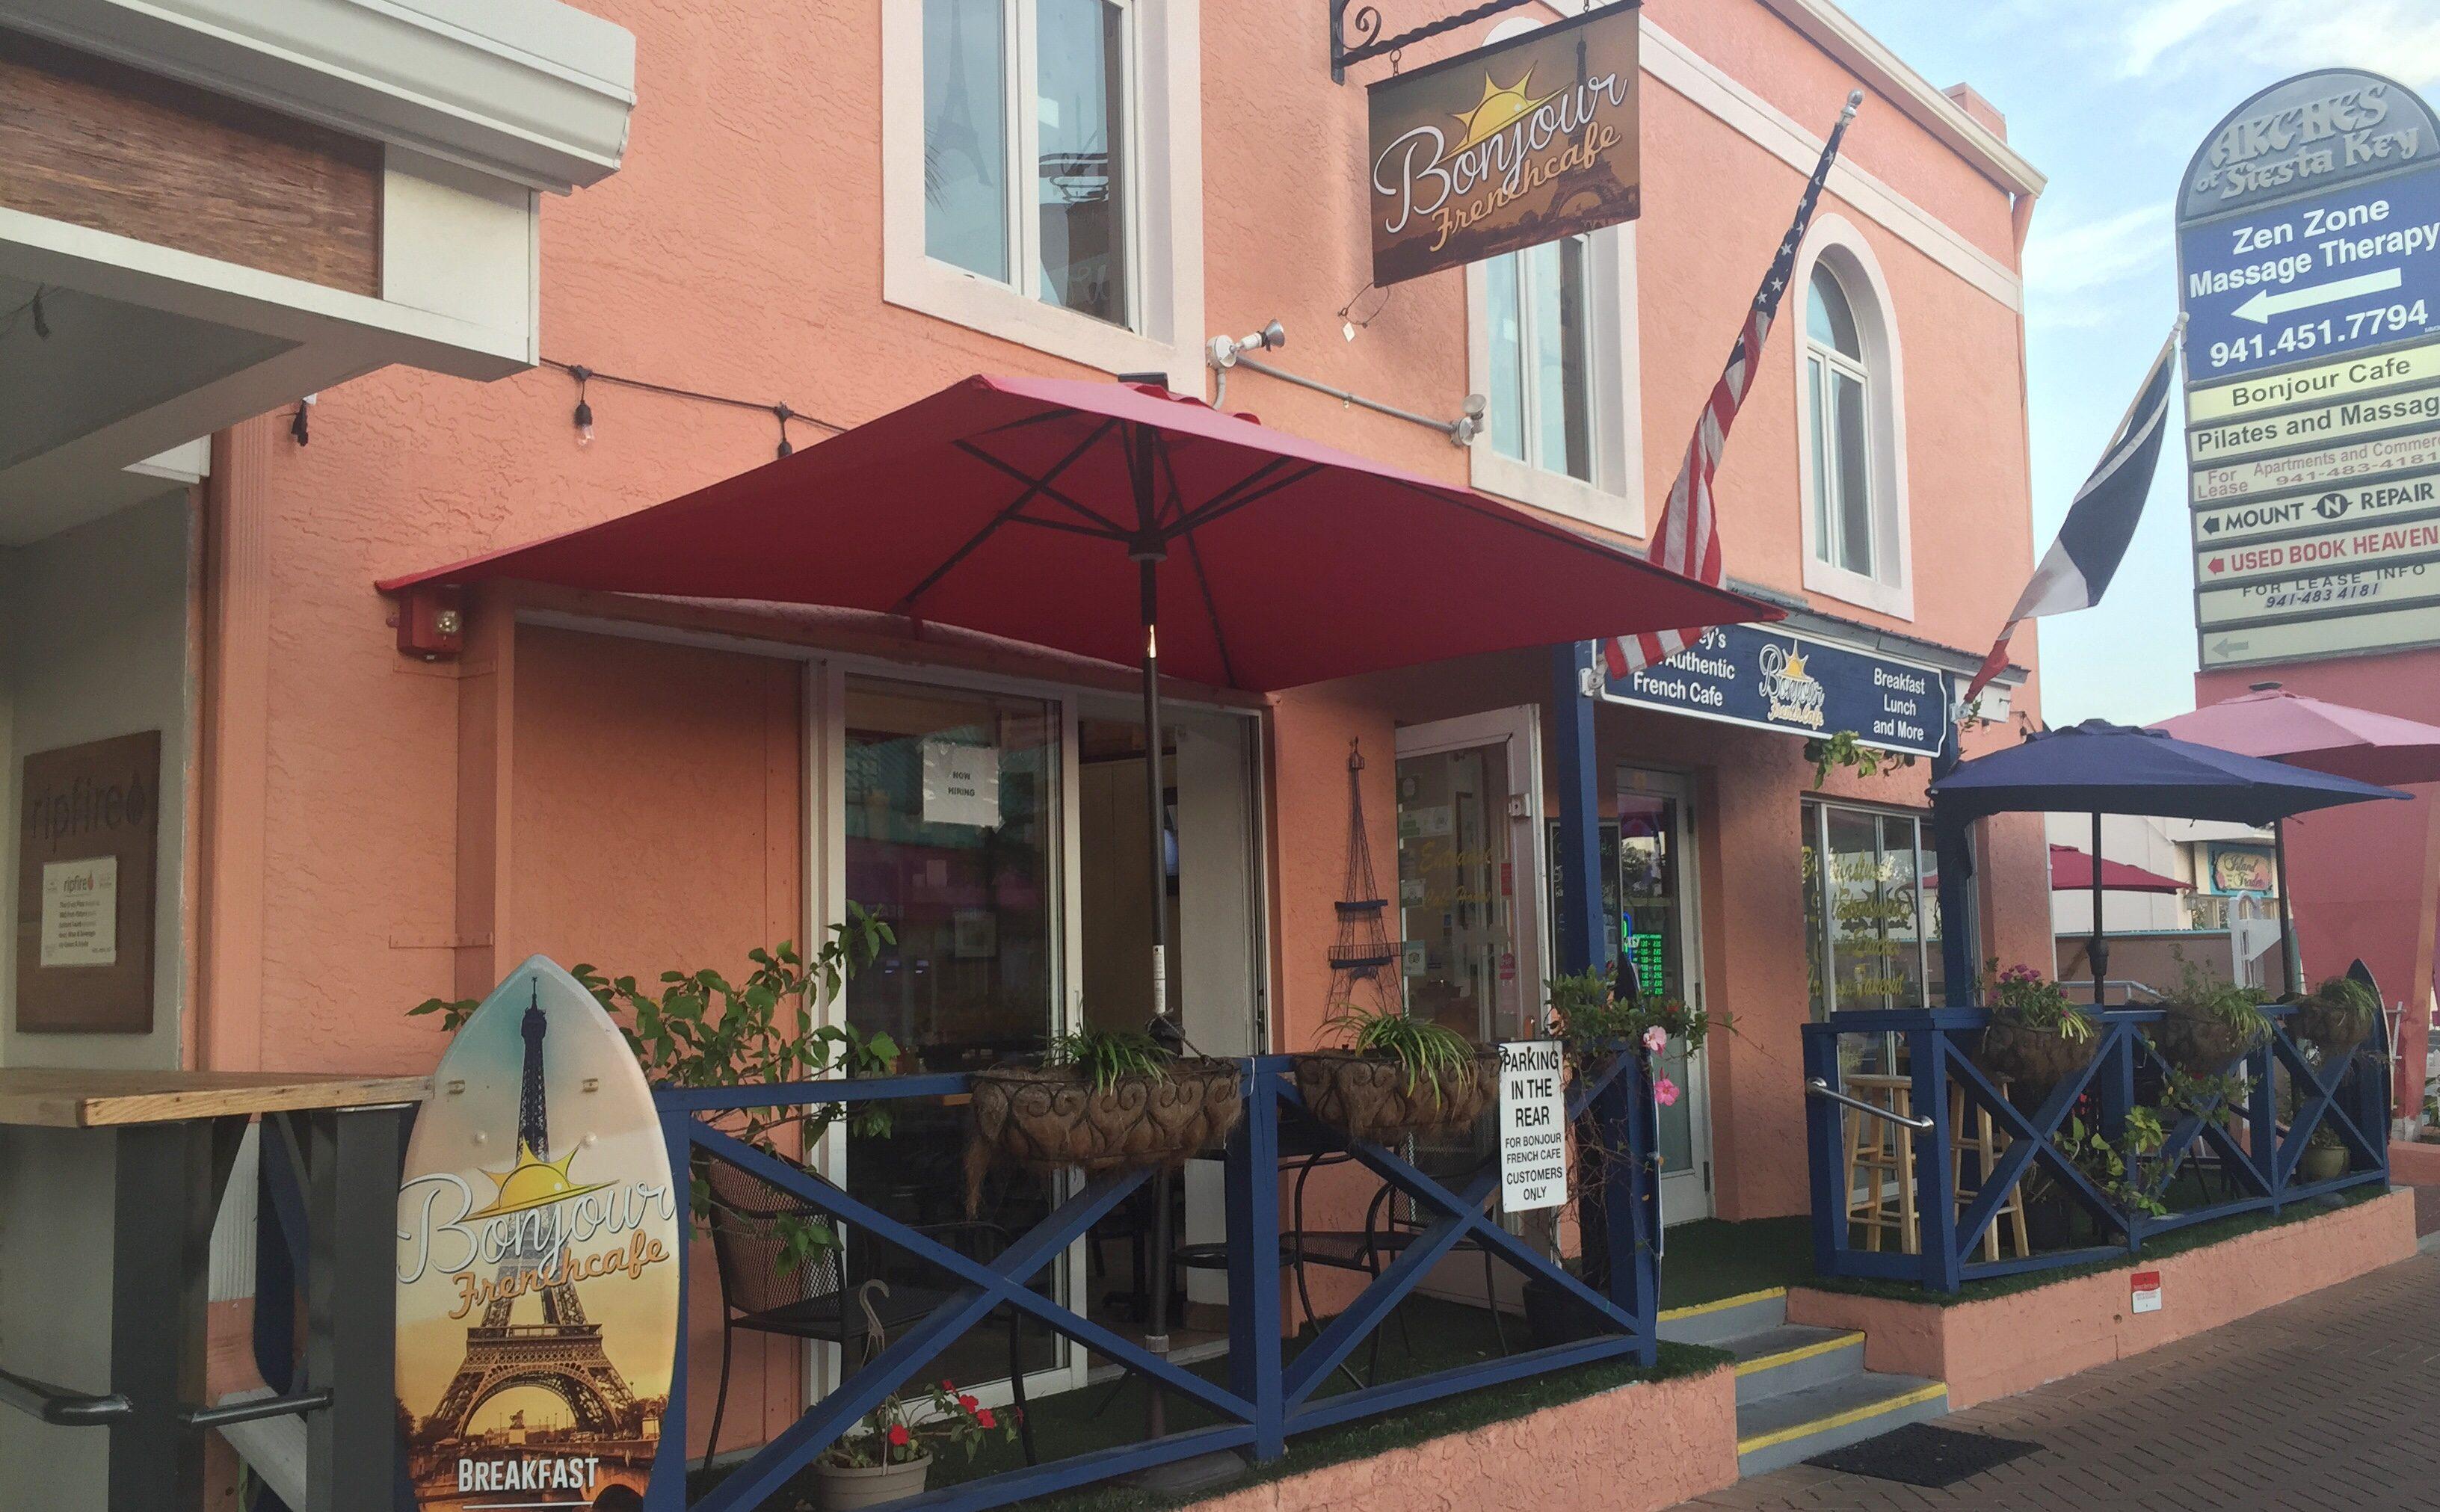 Bonjour French Cafe Siesta Key Breakfast Kid-Friendly Places to Eat in Siesta Key Toddling Traveler